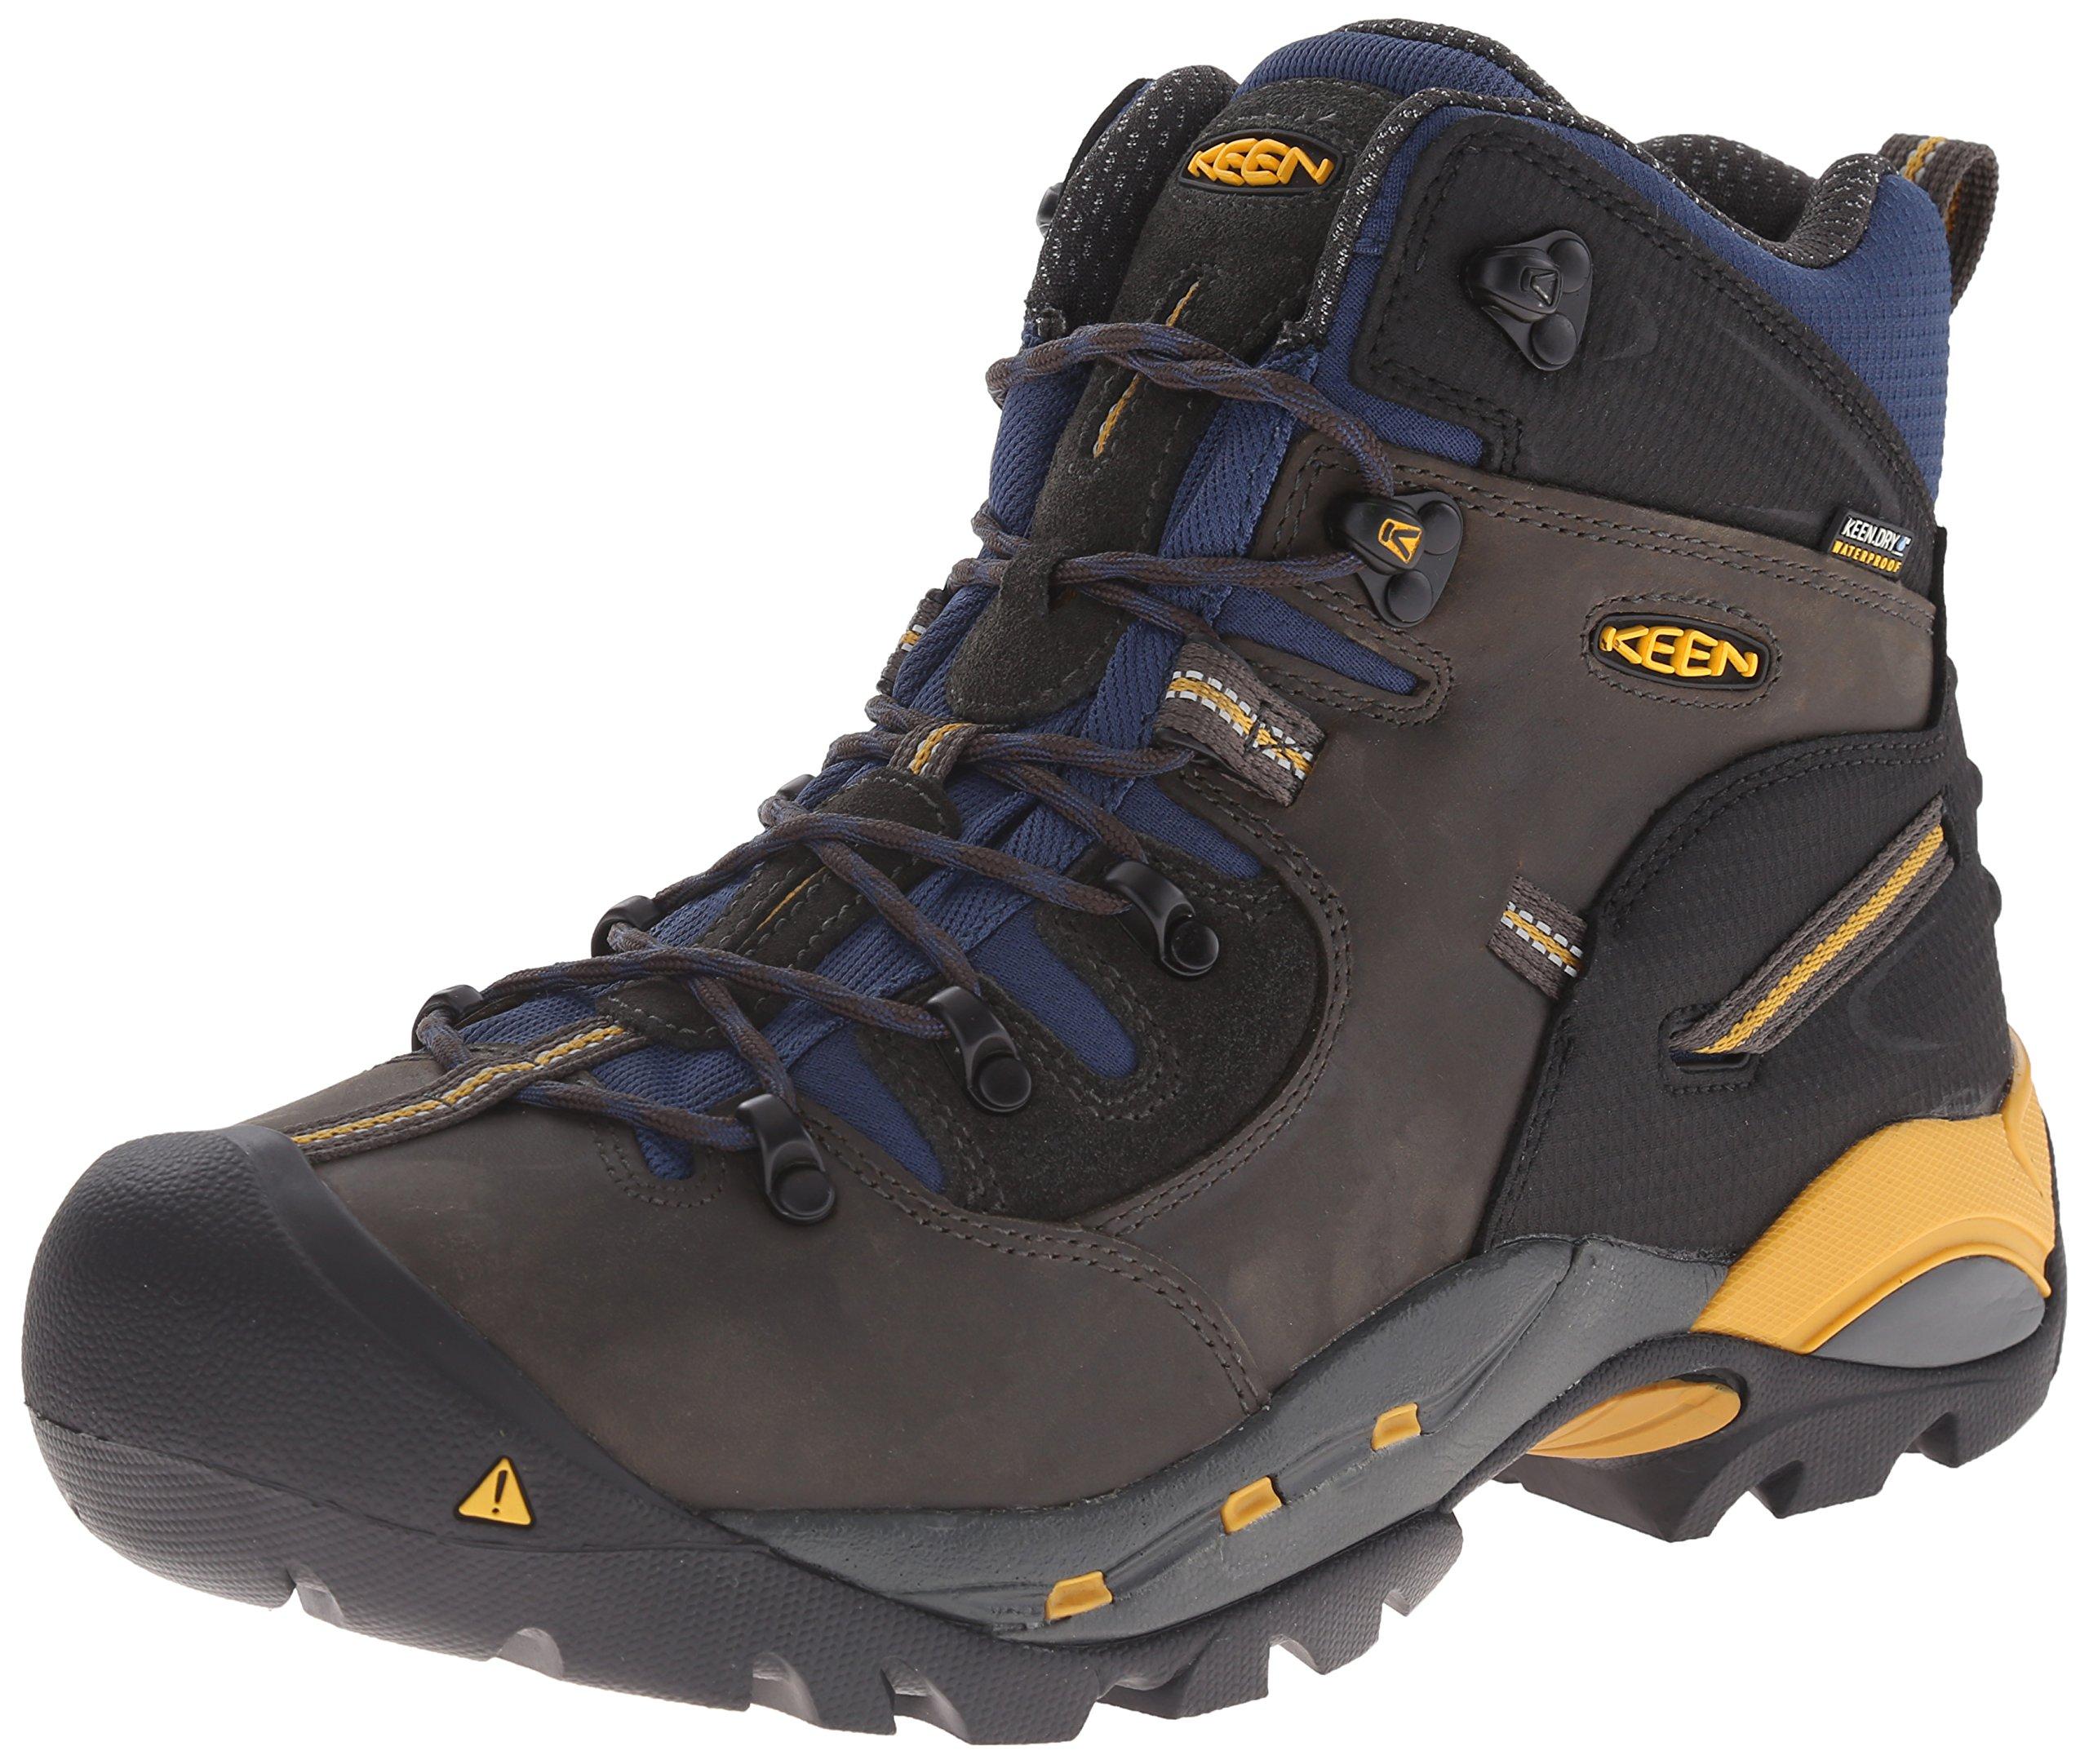 KEEN Utility Men's Pittsburgh Work Boot (Steel Toe),Raven/Yellow,10 D US